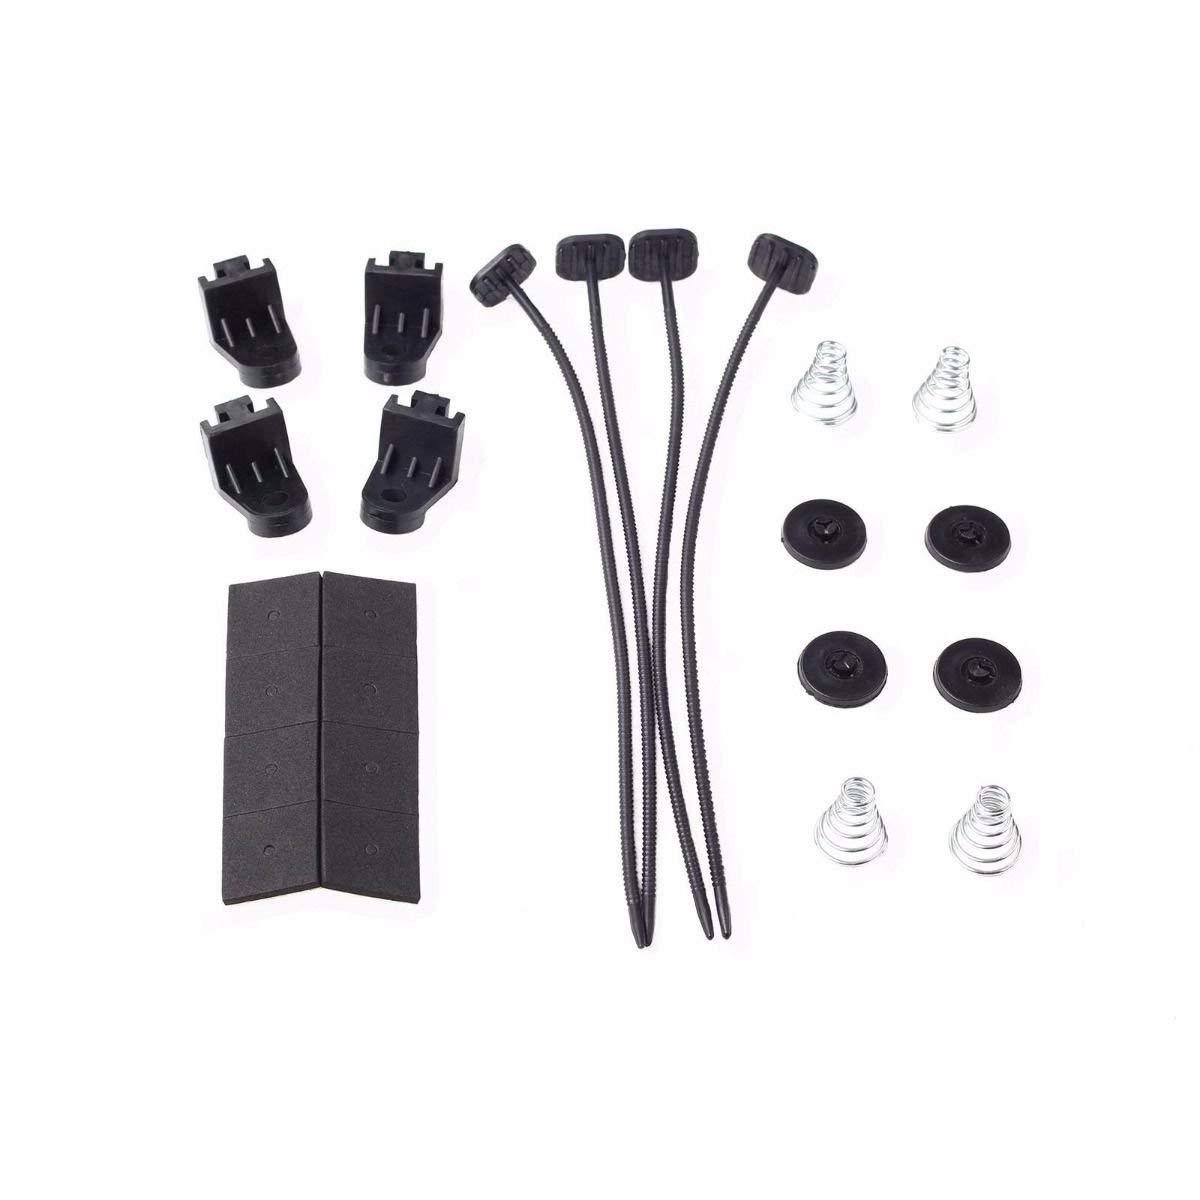 CFM Thermostat Wiring Switch Relay Kit Black 7 inch BLACKHORSE-RACING 7 Electric Radiator Fan High 3000